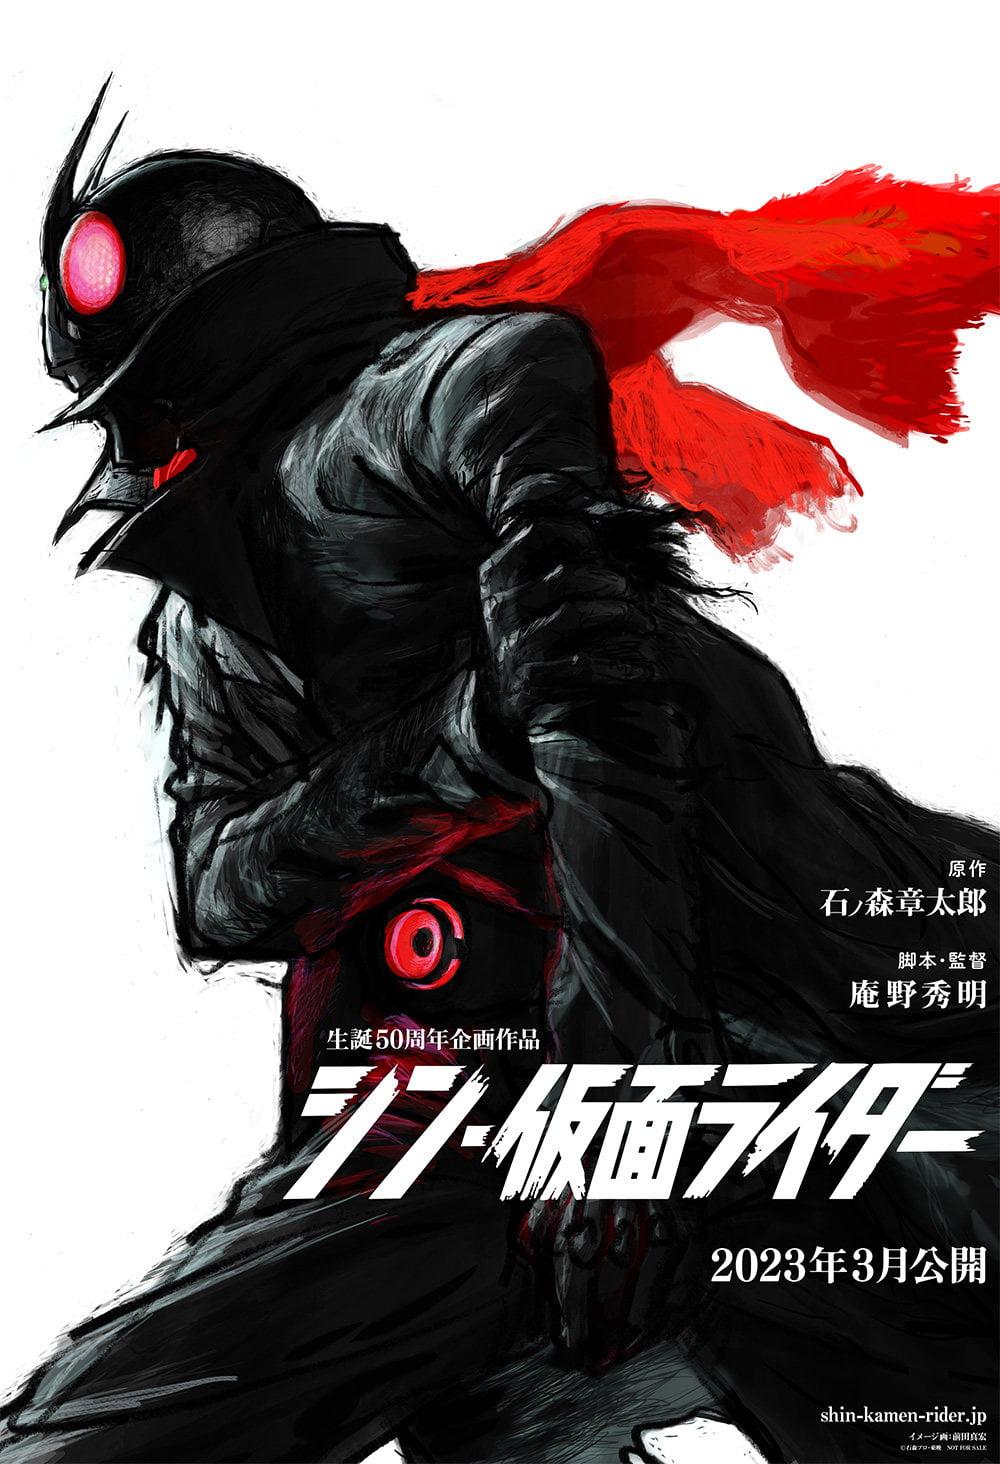 Shin Kamen Rider poster